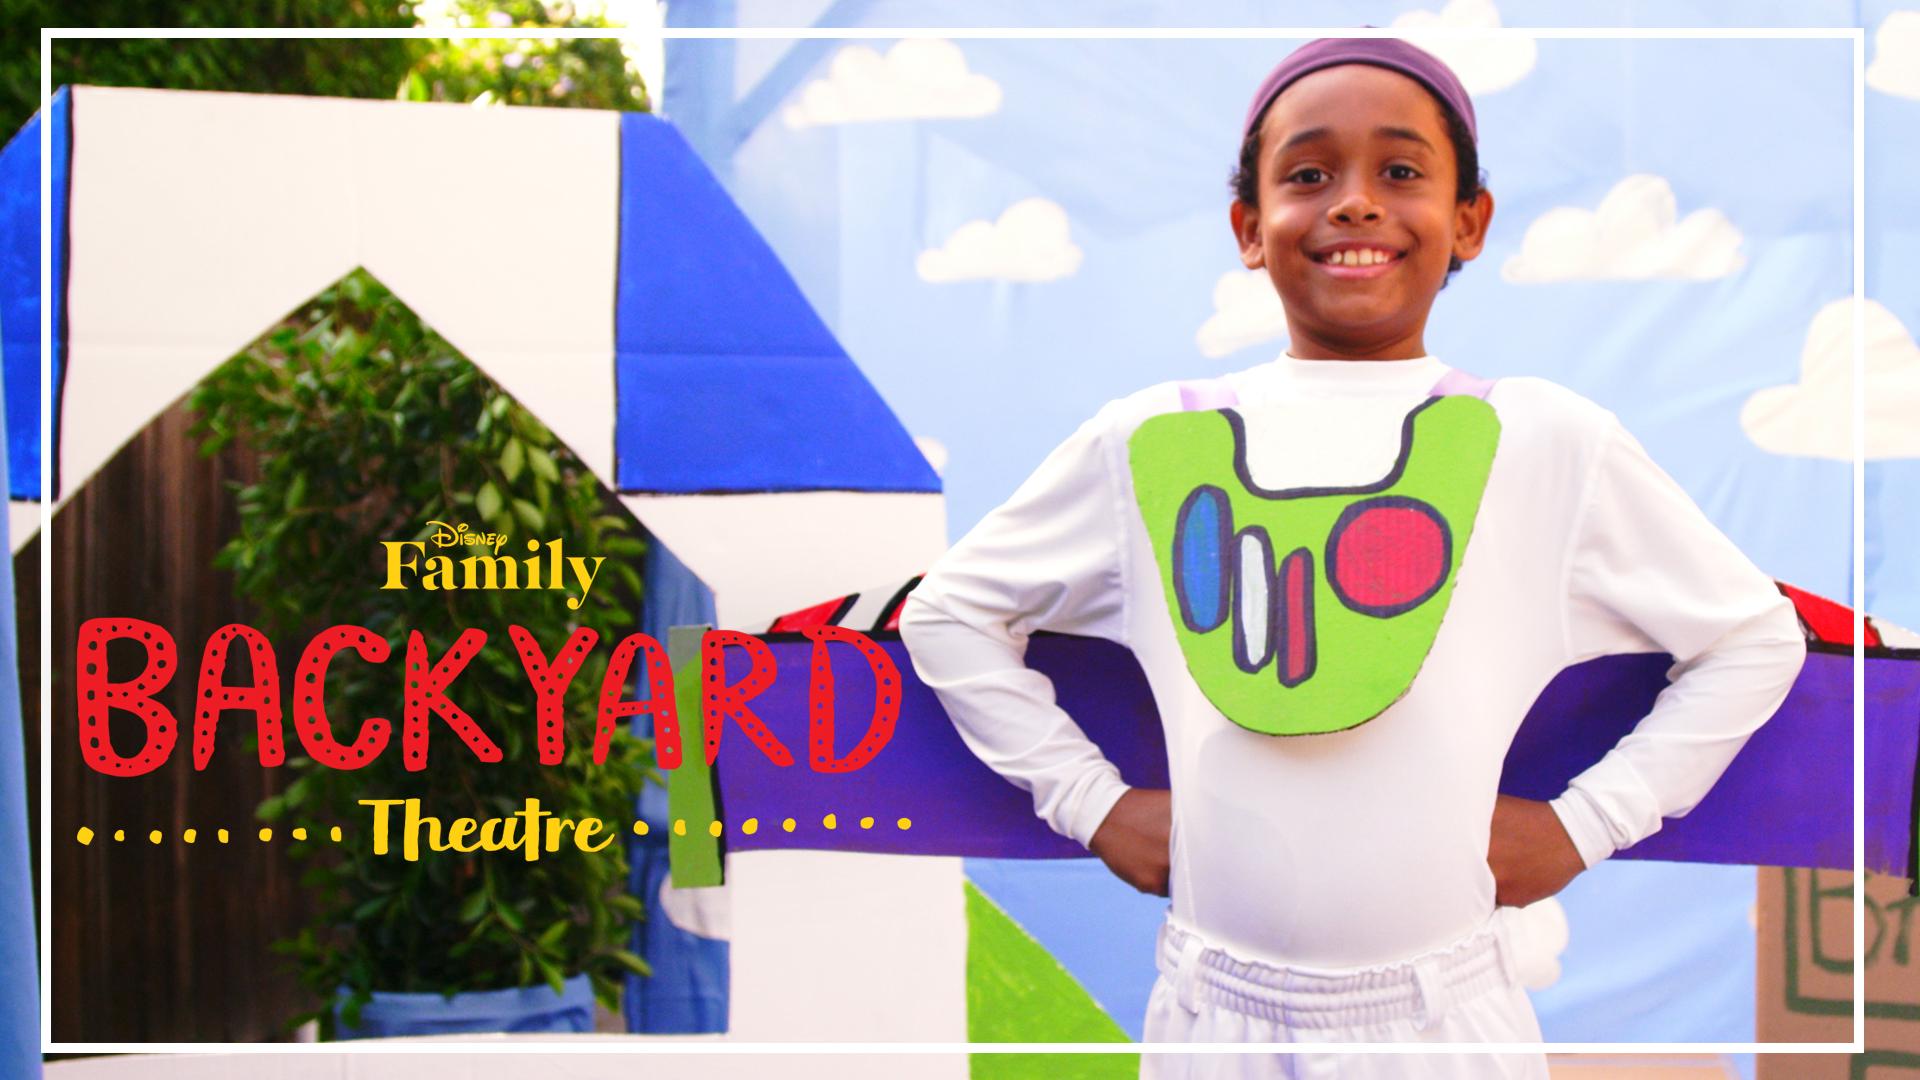 Backyard Theatre: Buzz Costume DIY | Disney Family